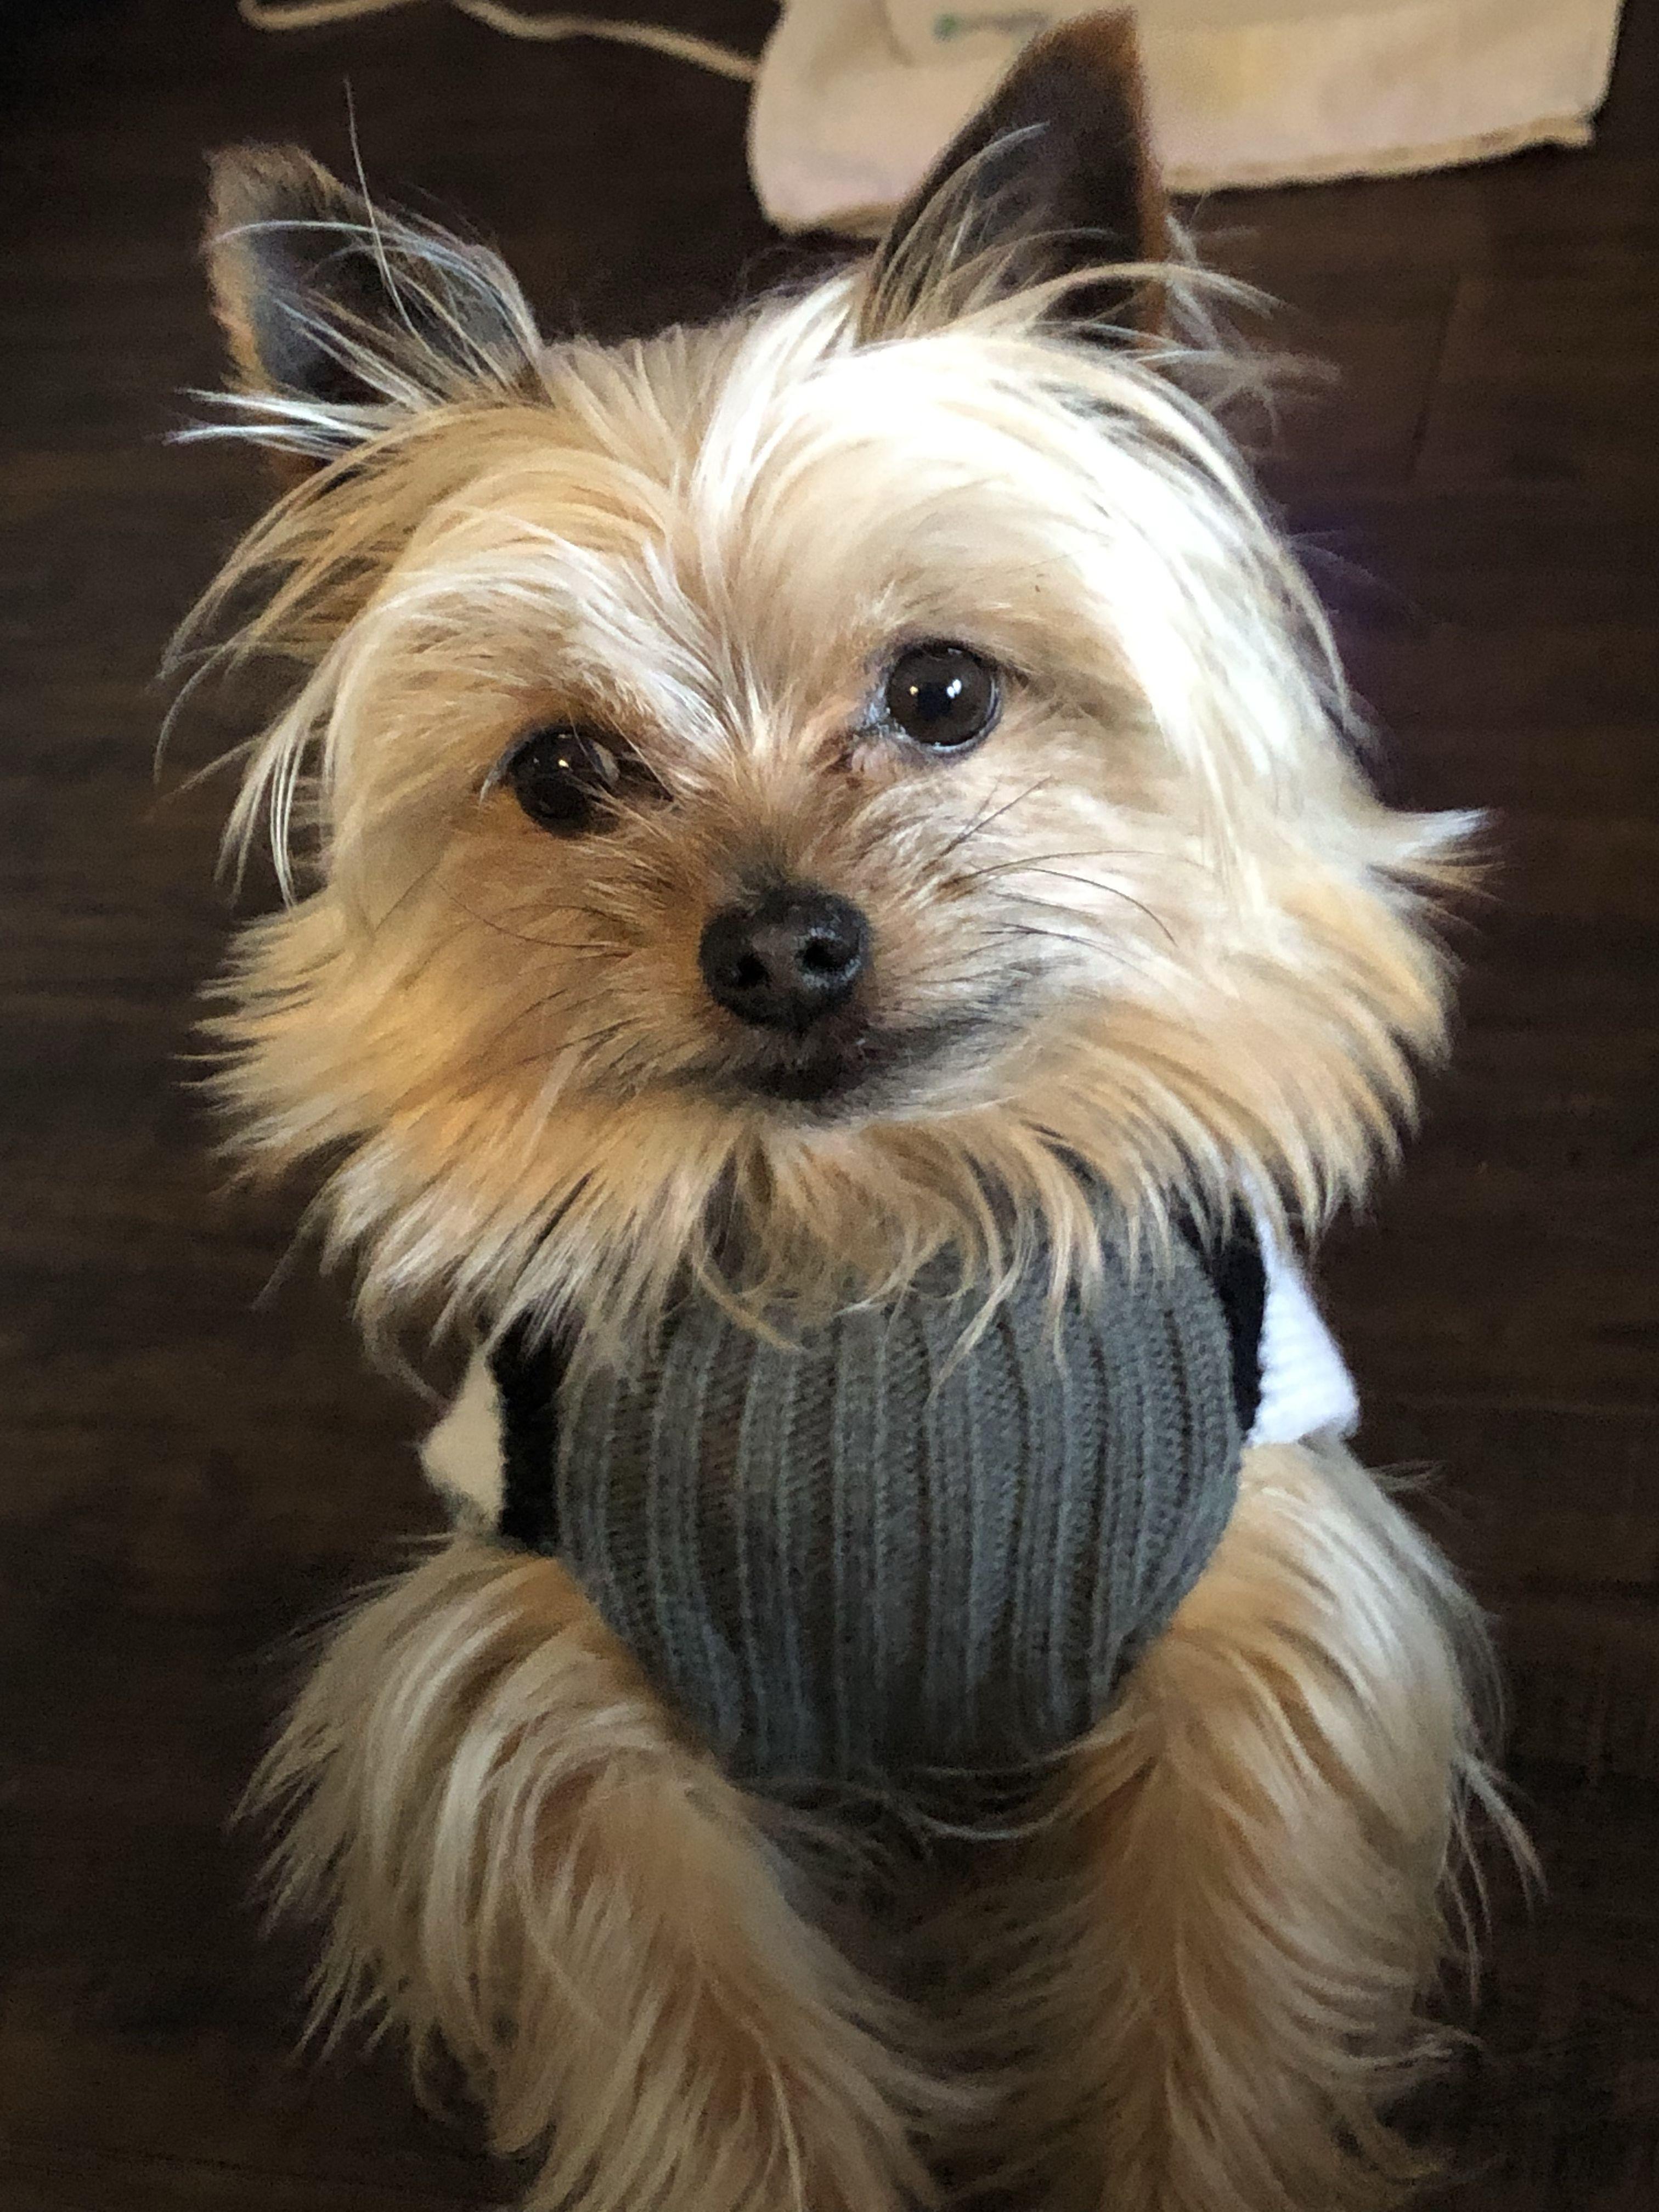 Oak Ridge Nj Yorkie Yorkshire Terrier Mix Meet Nadia Help A Dog For Adoption Yorkie Yorkshire Terrier Yorkie Yorkshire Terrier